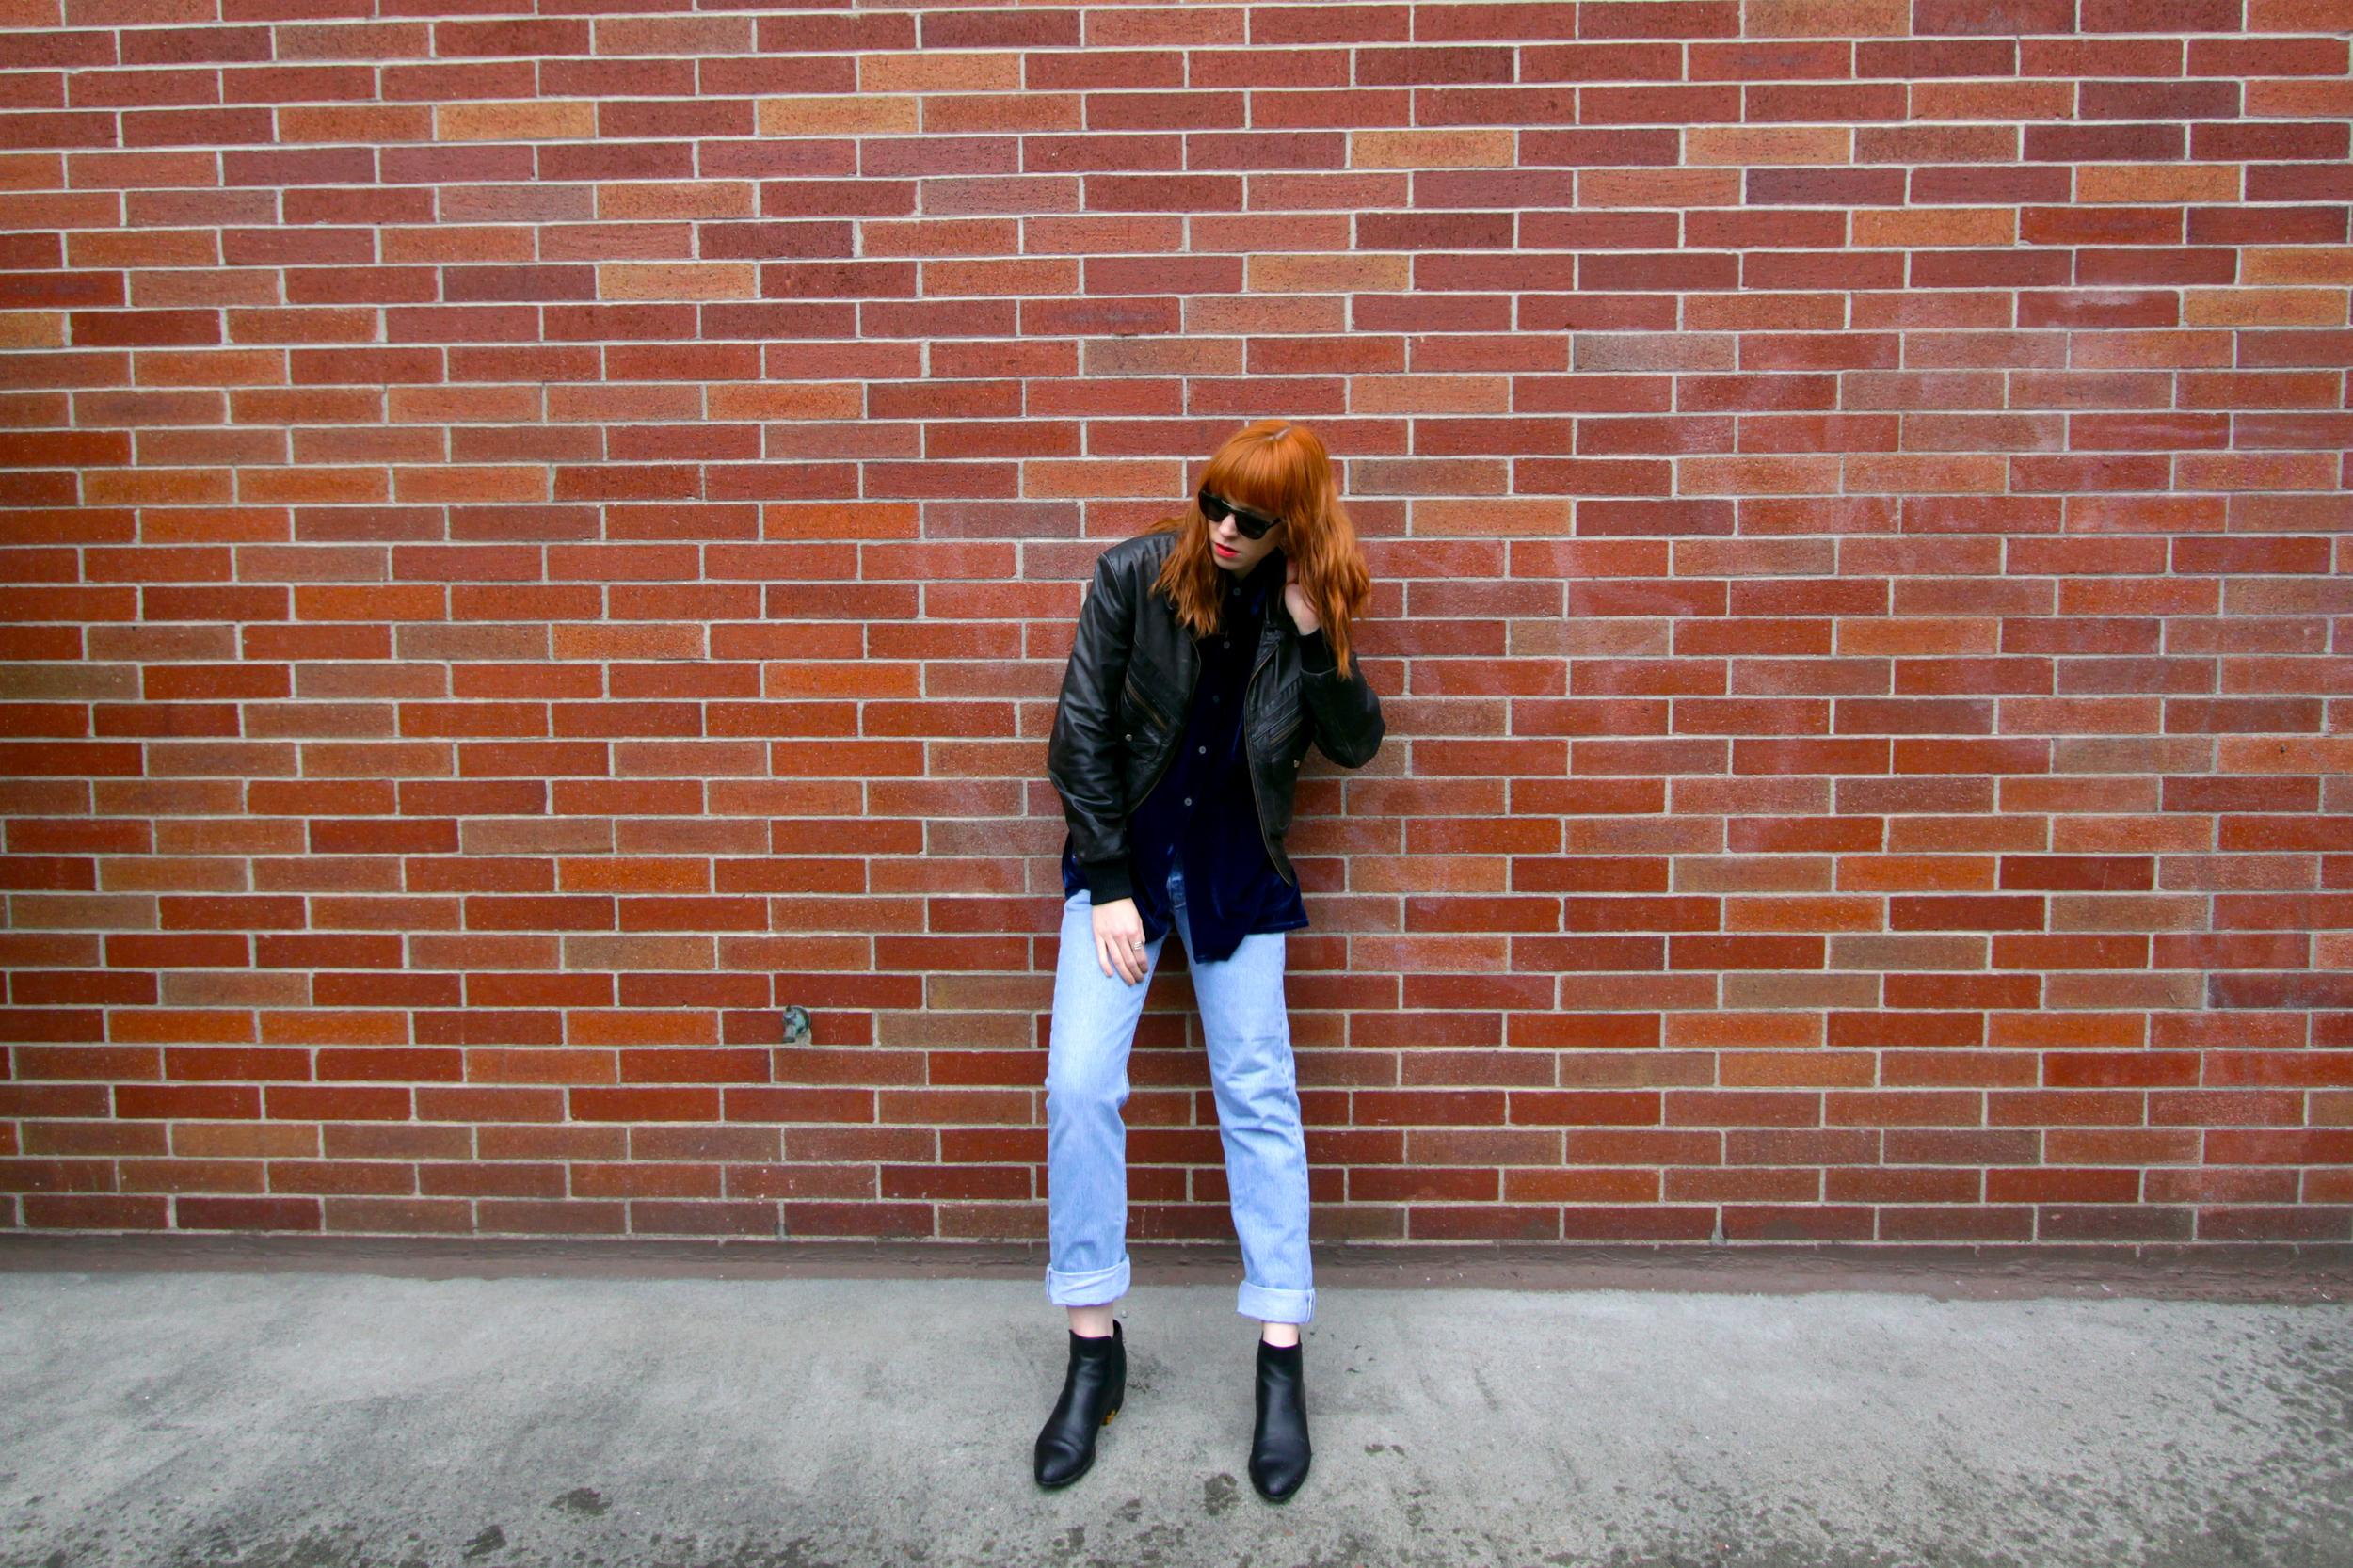 seattle-fashion-blog-art-of-wore.jpg